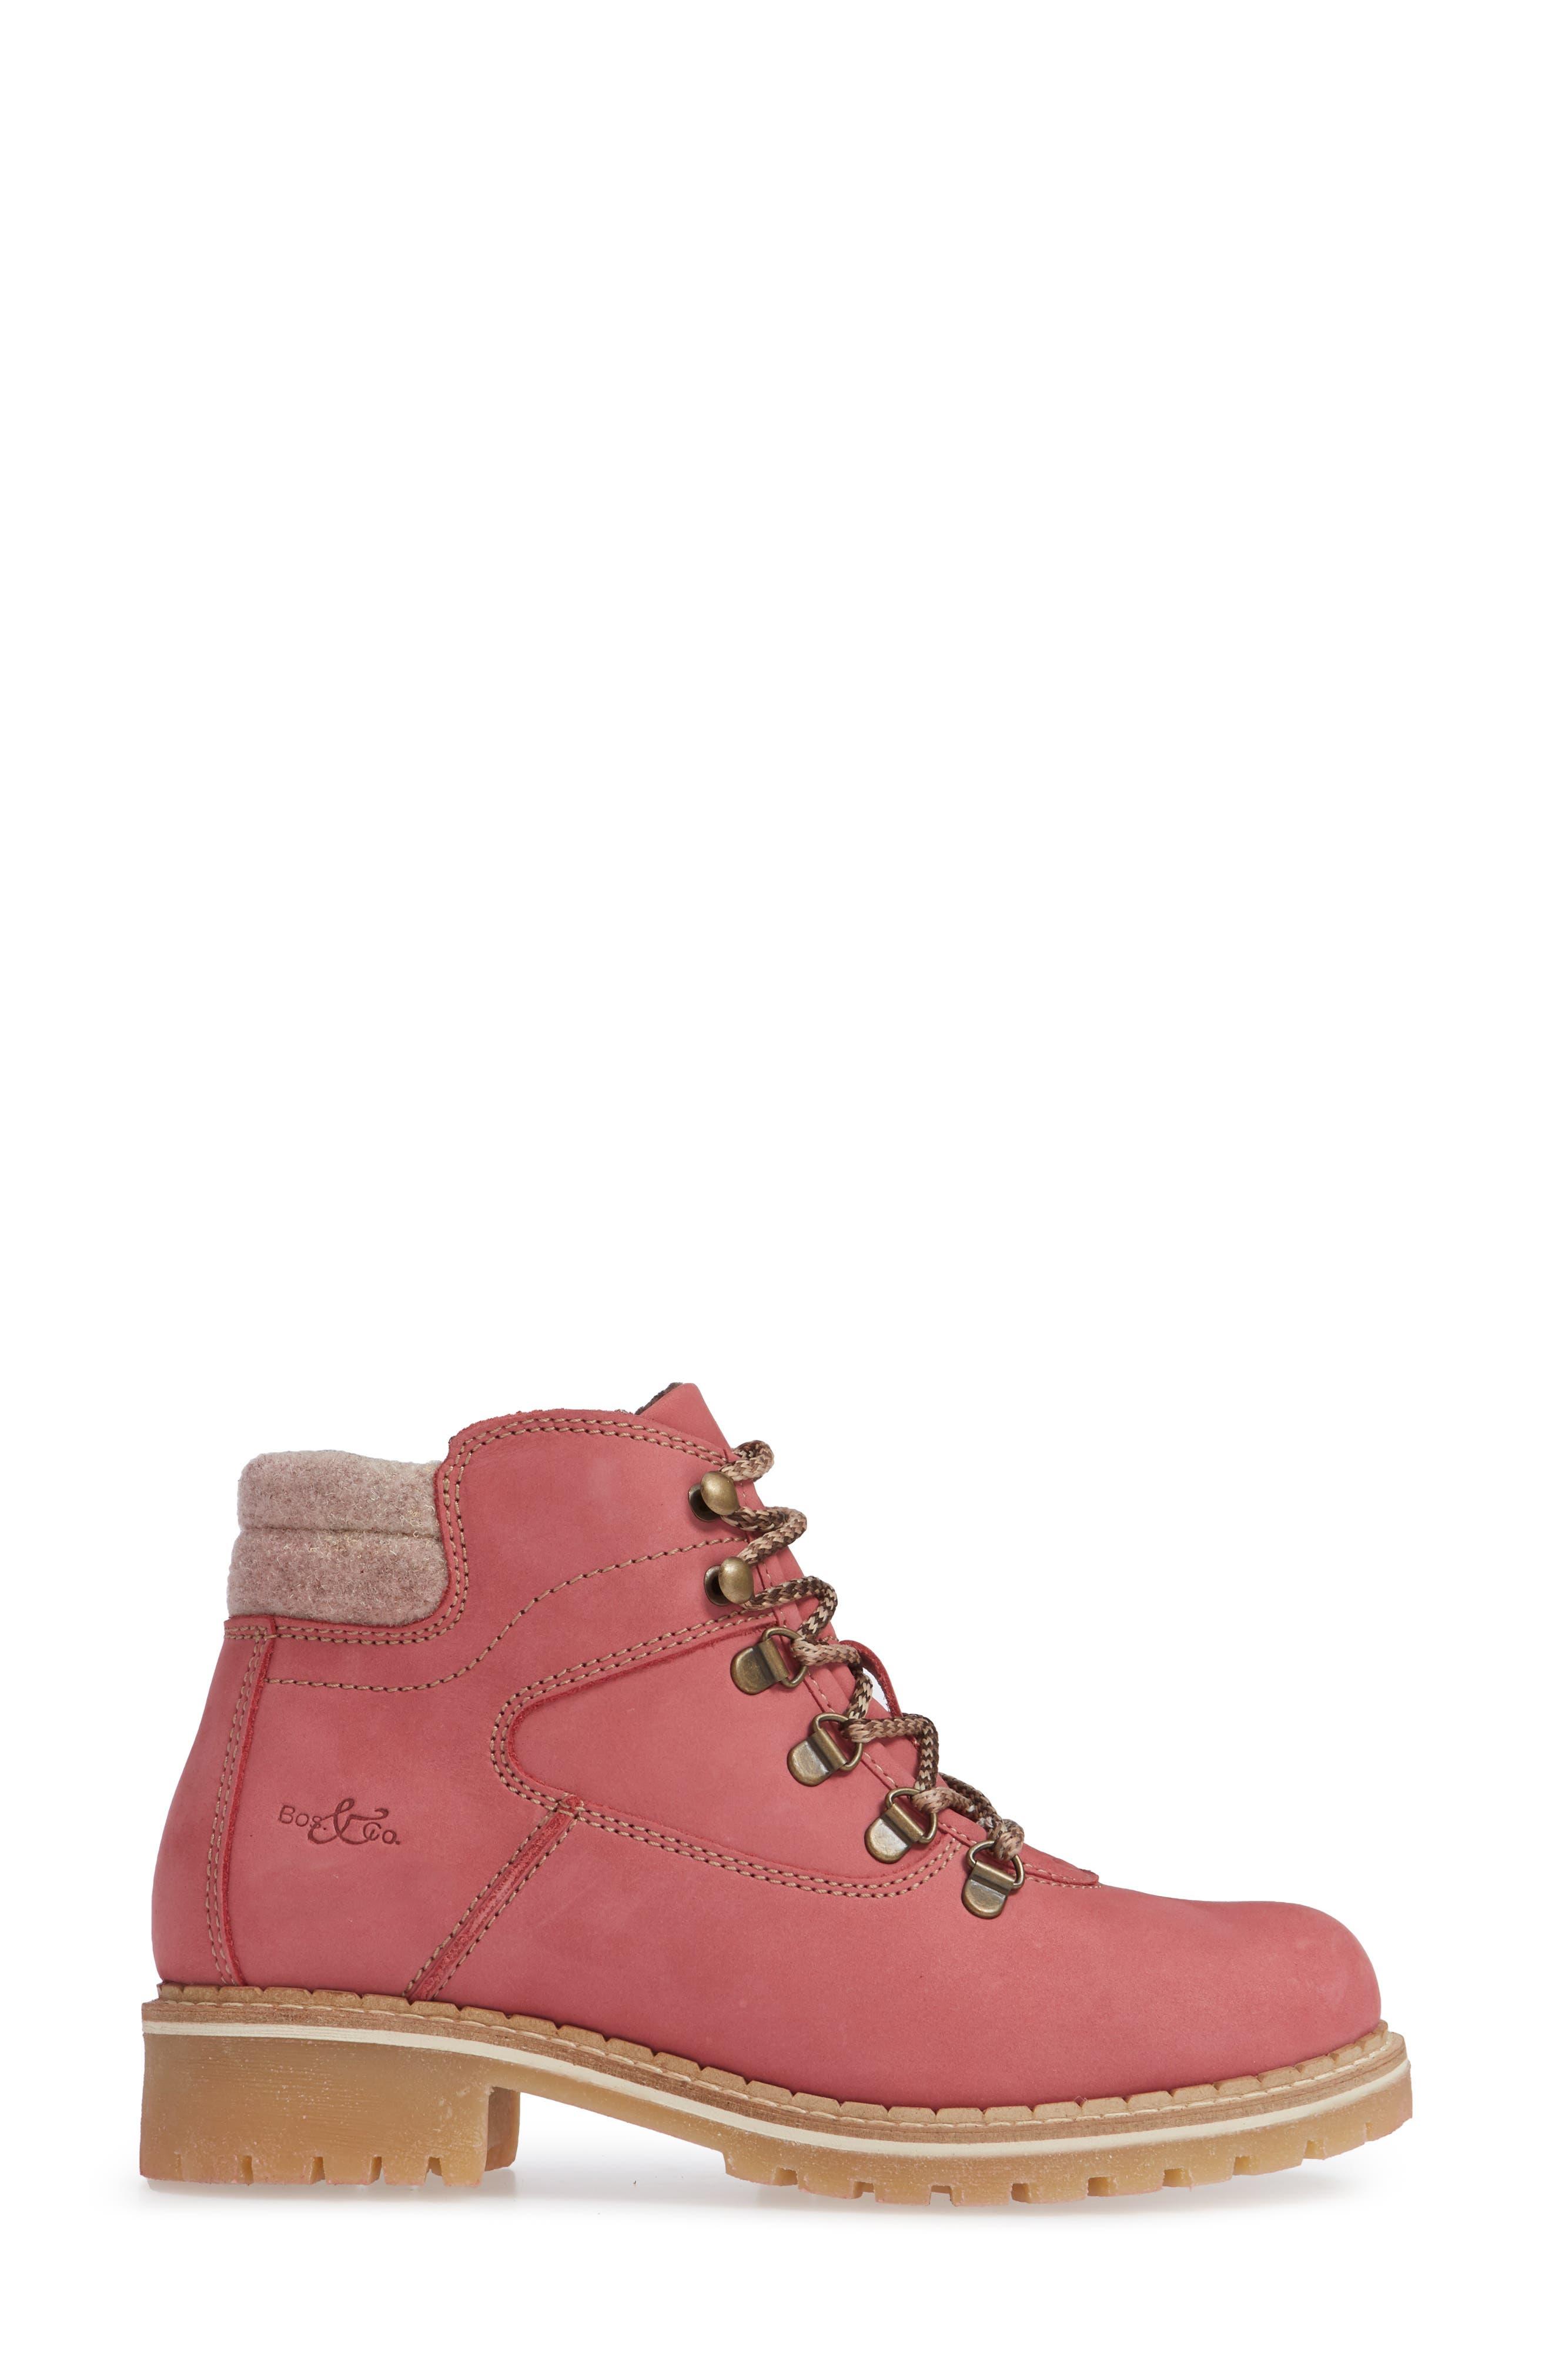 Hartney Waterproof Boot,                             Alternate thumbnail 4, color,                             Rosa Wool